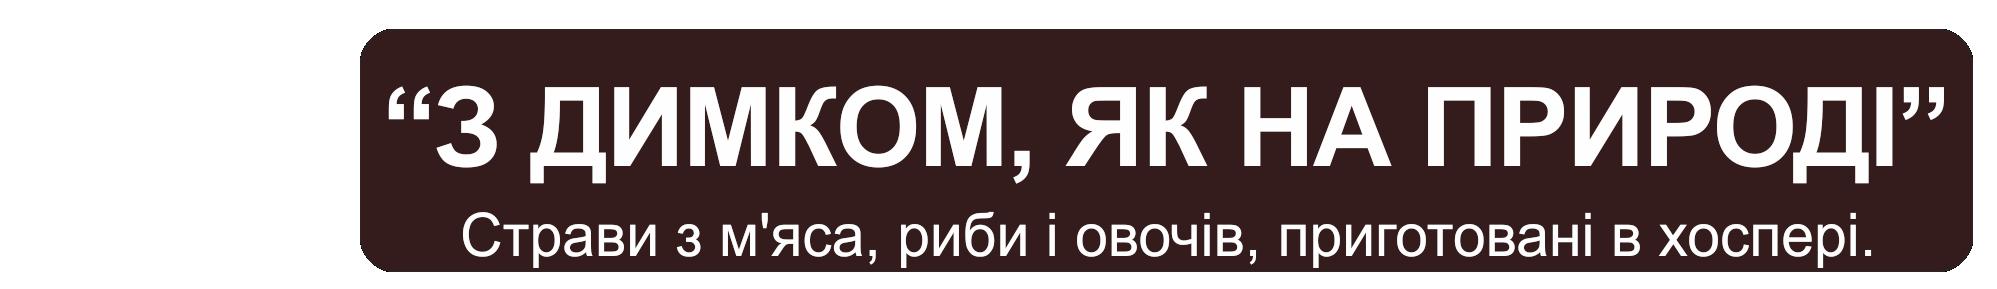 img2_06